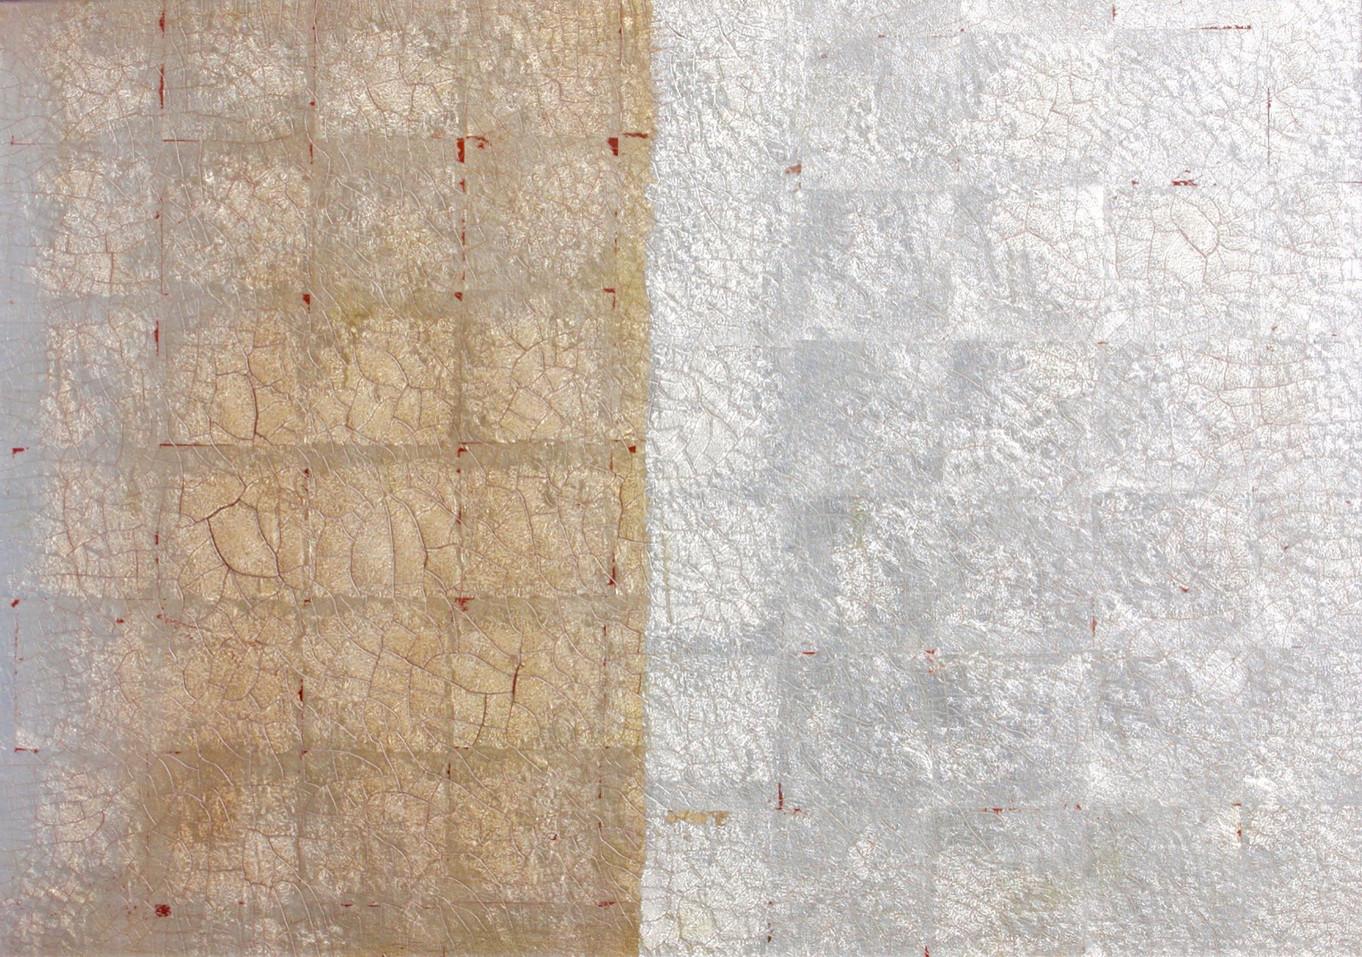 Claire Burke decorative wall art for interiors